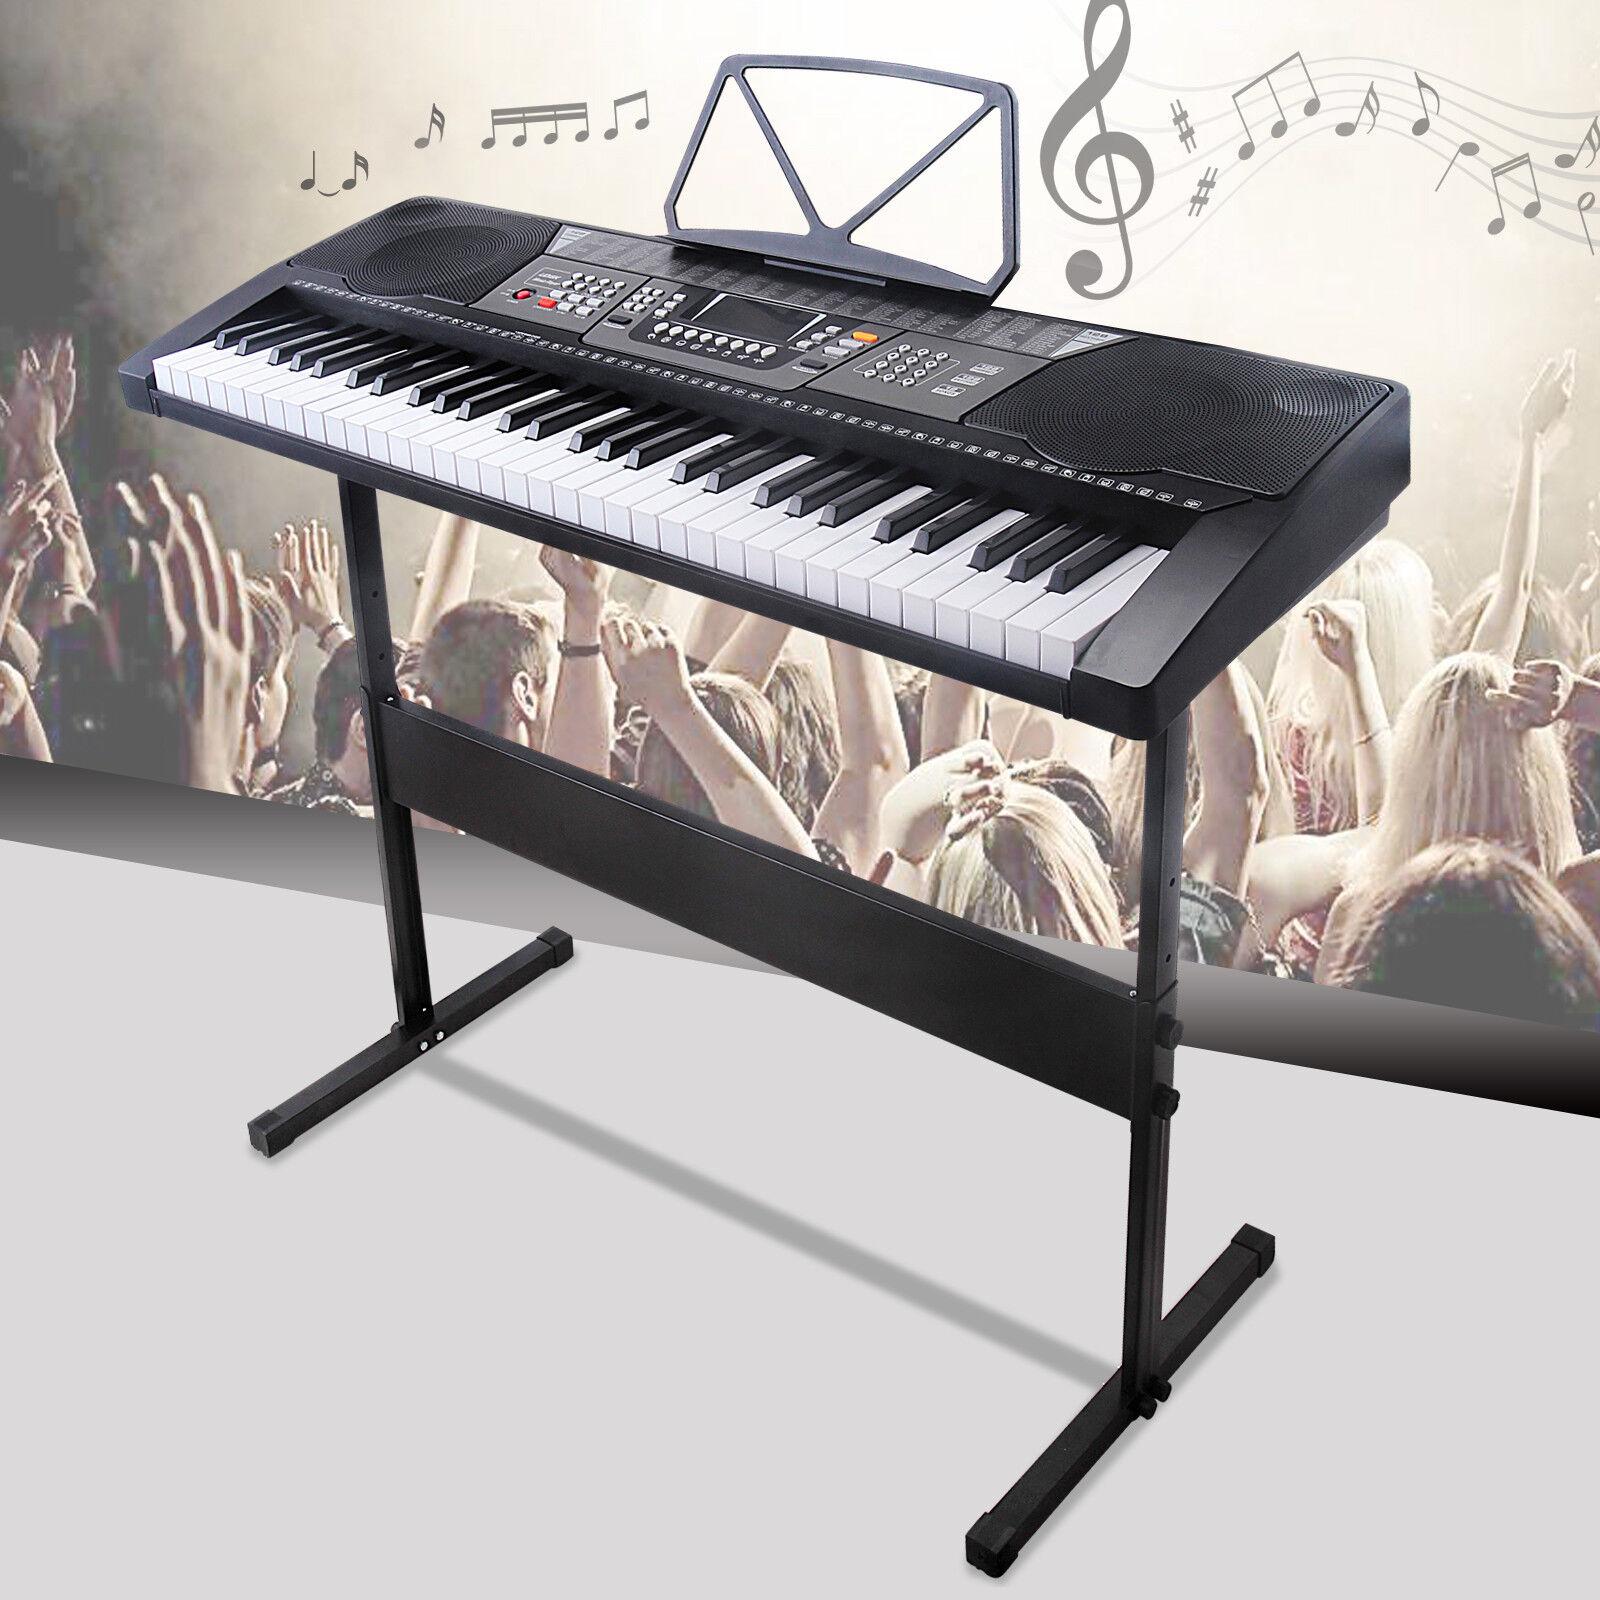 Electronic Piano Or Keyboard : 61 key music electronic keyboard electric digital piano organ portable w stand 699979709115 ebay ~ Hamham.info Haus und Dekorationen